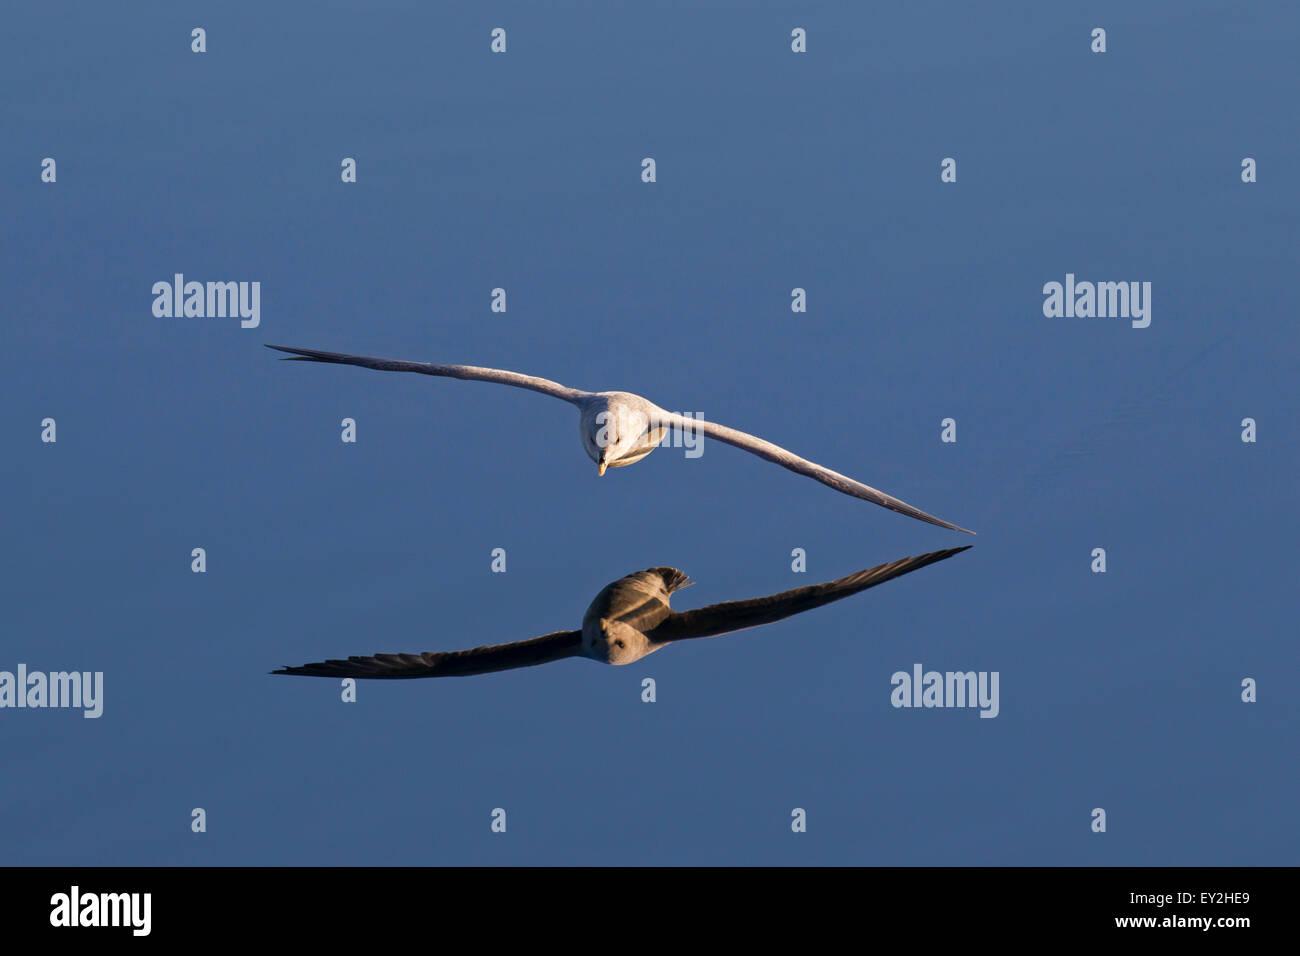 Northern fulmar / Arctic fulmar (Fulmarus glacialis) soaring above the sea water - Stock Image